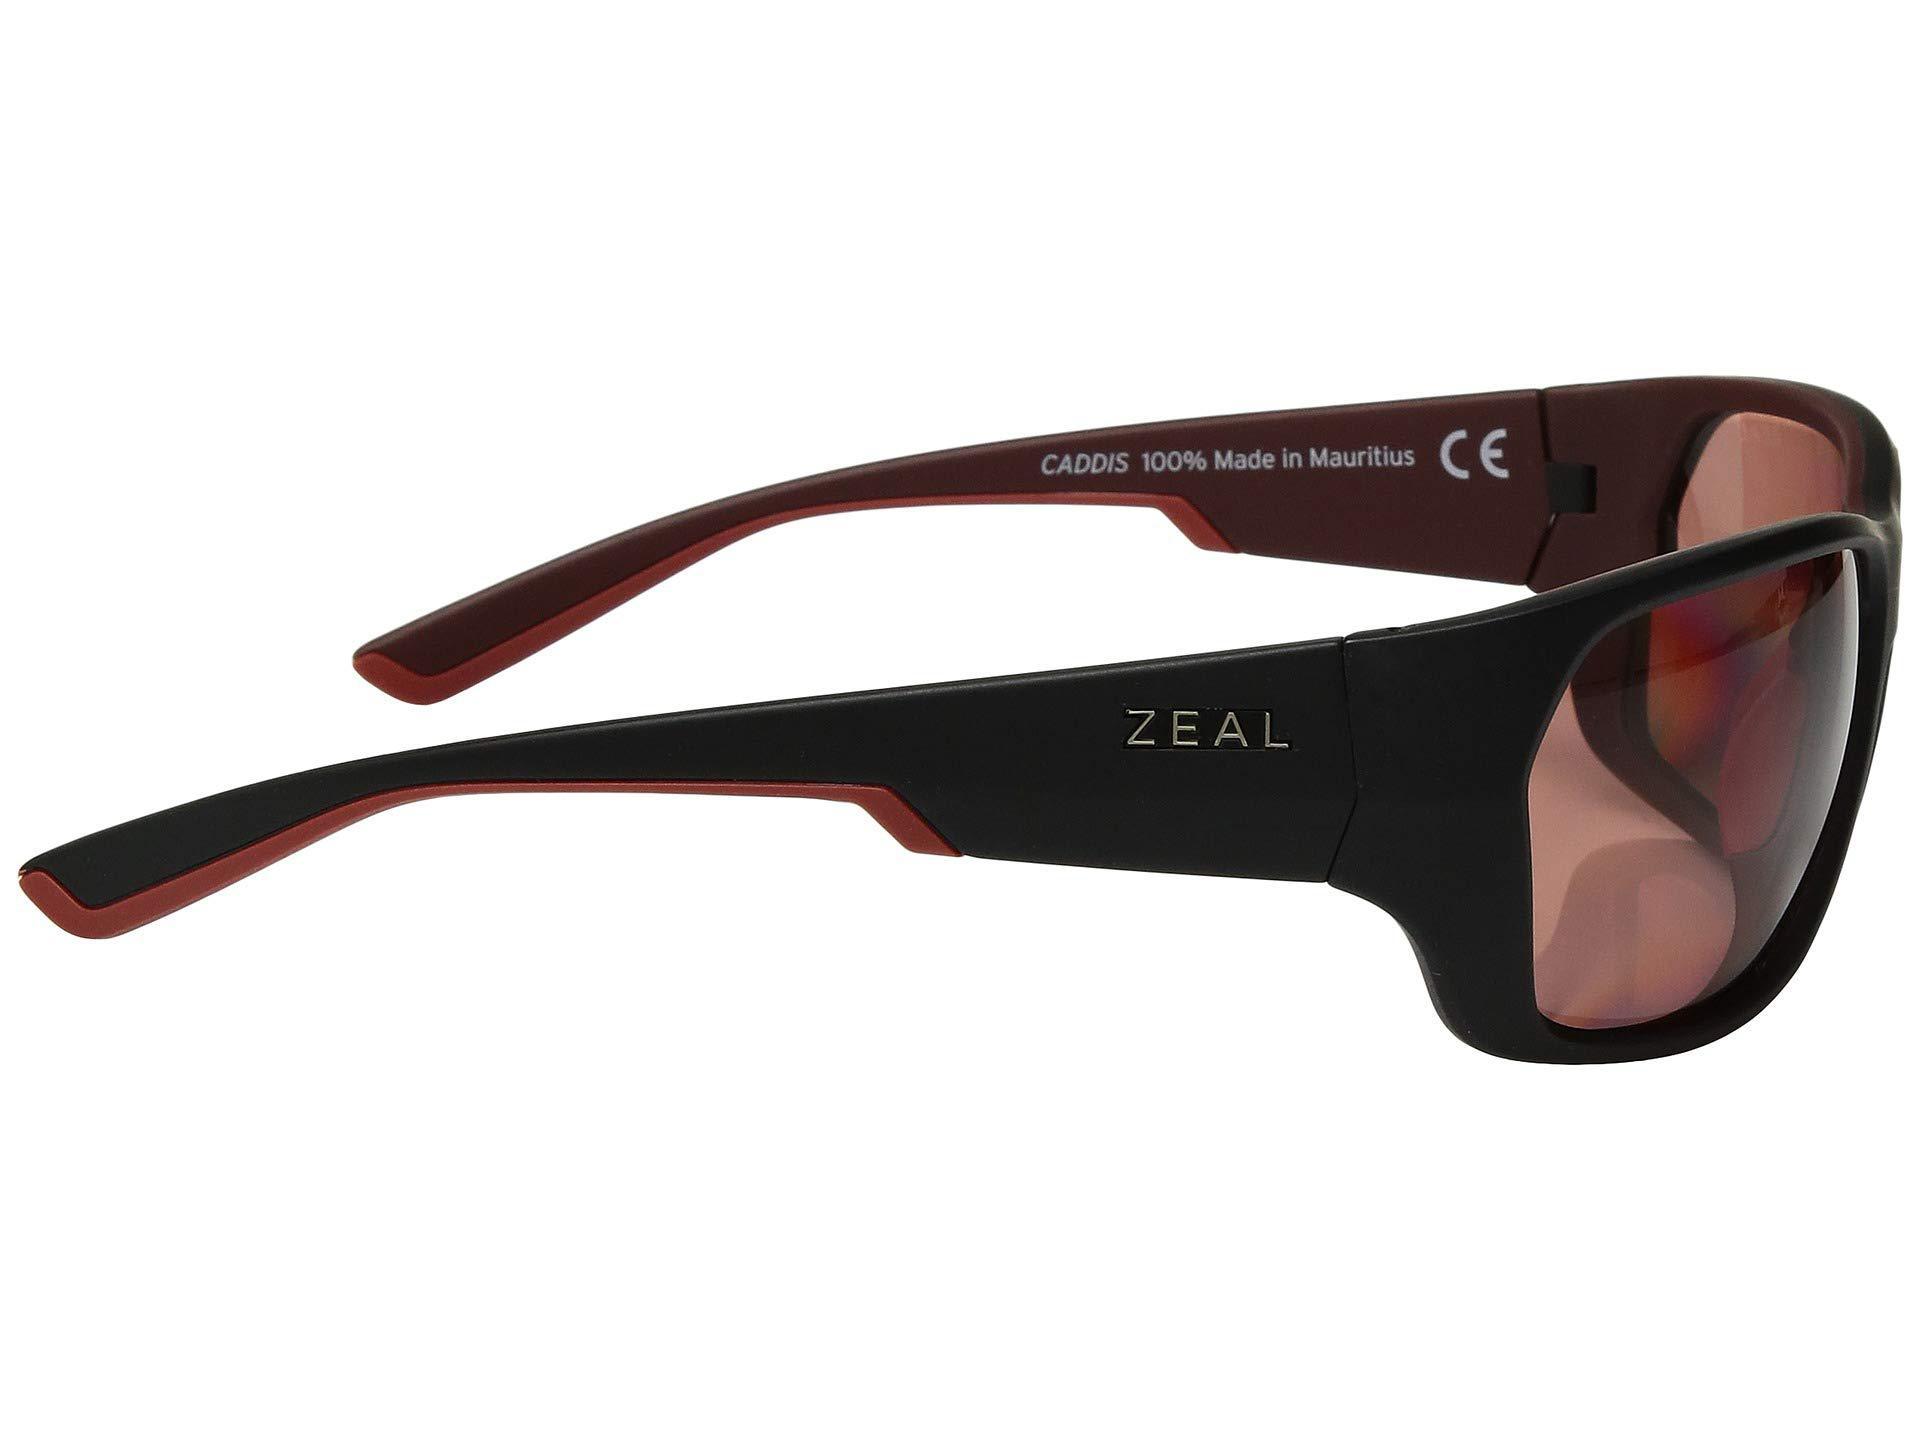 a8d222a4ef4 Lyst - Zeal Optics Caddis (matte Brown Khaki W  Polarized Copper ...